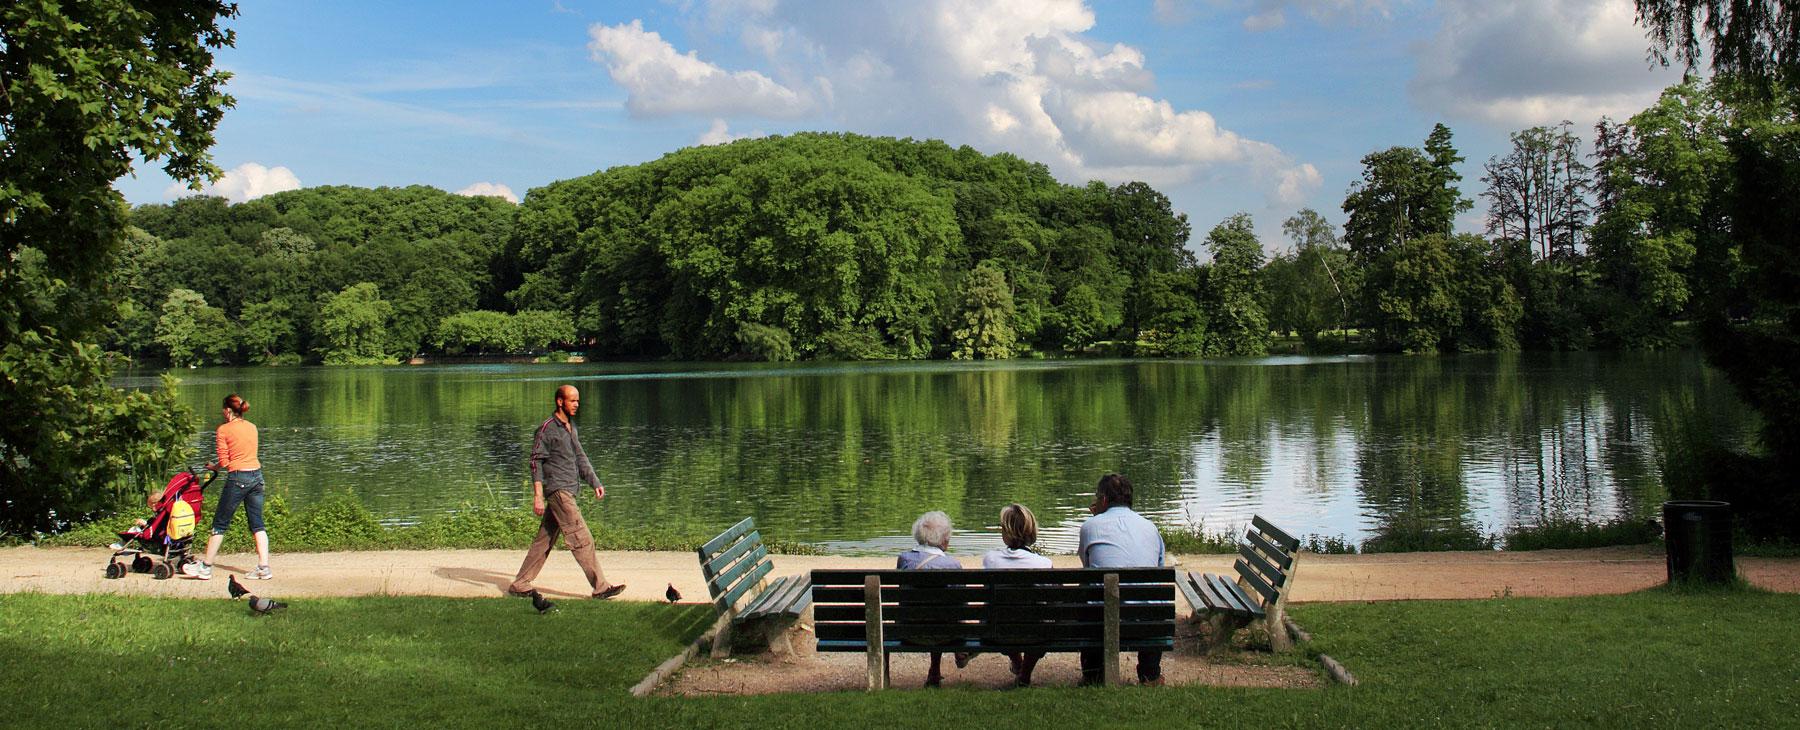 Grand parc miribel jonage vaulx en velin patrimoine - Piscine de villefranche sur saone ...